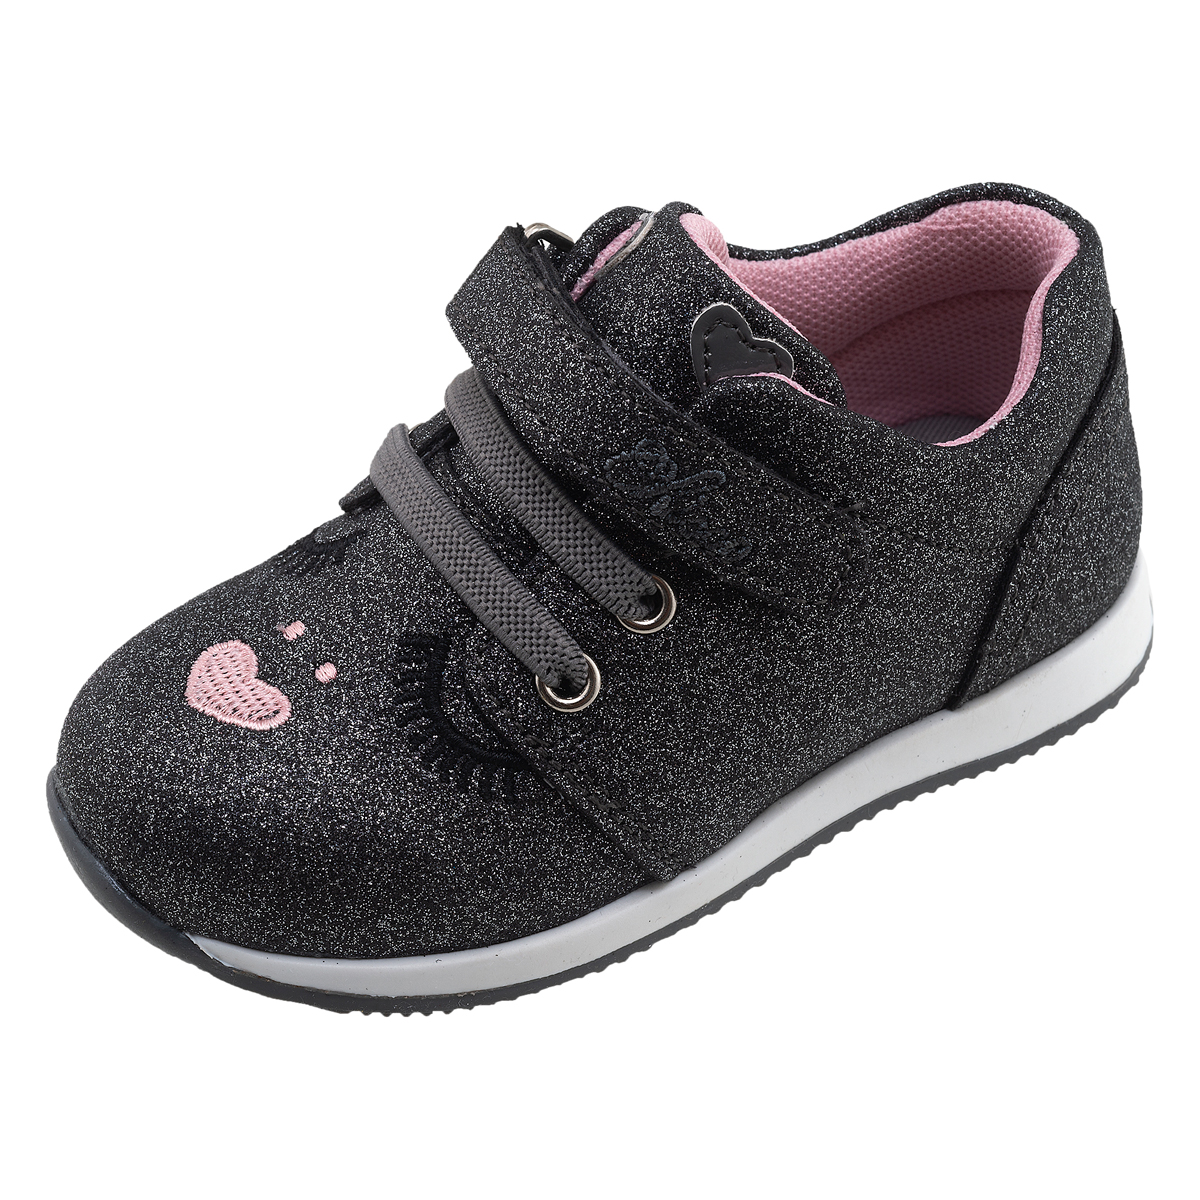 Pantofi Copii Chicco Fulvia, Gri Inchis, 64366 imagine